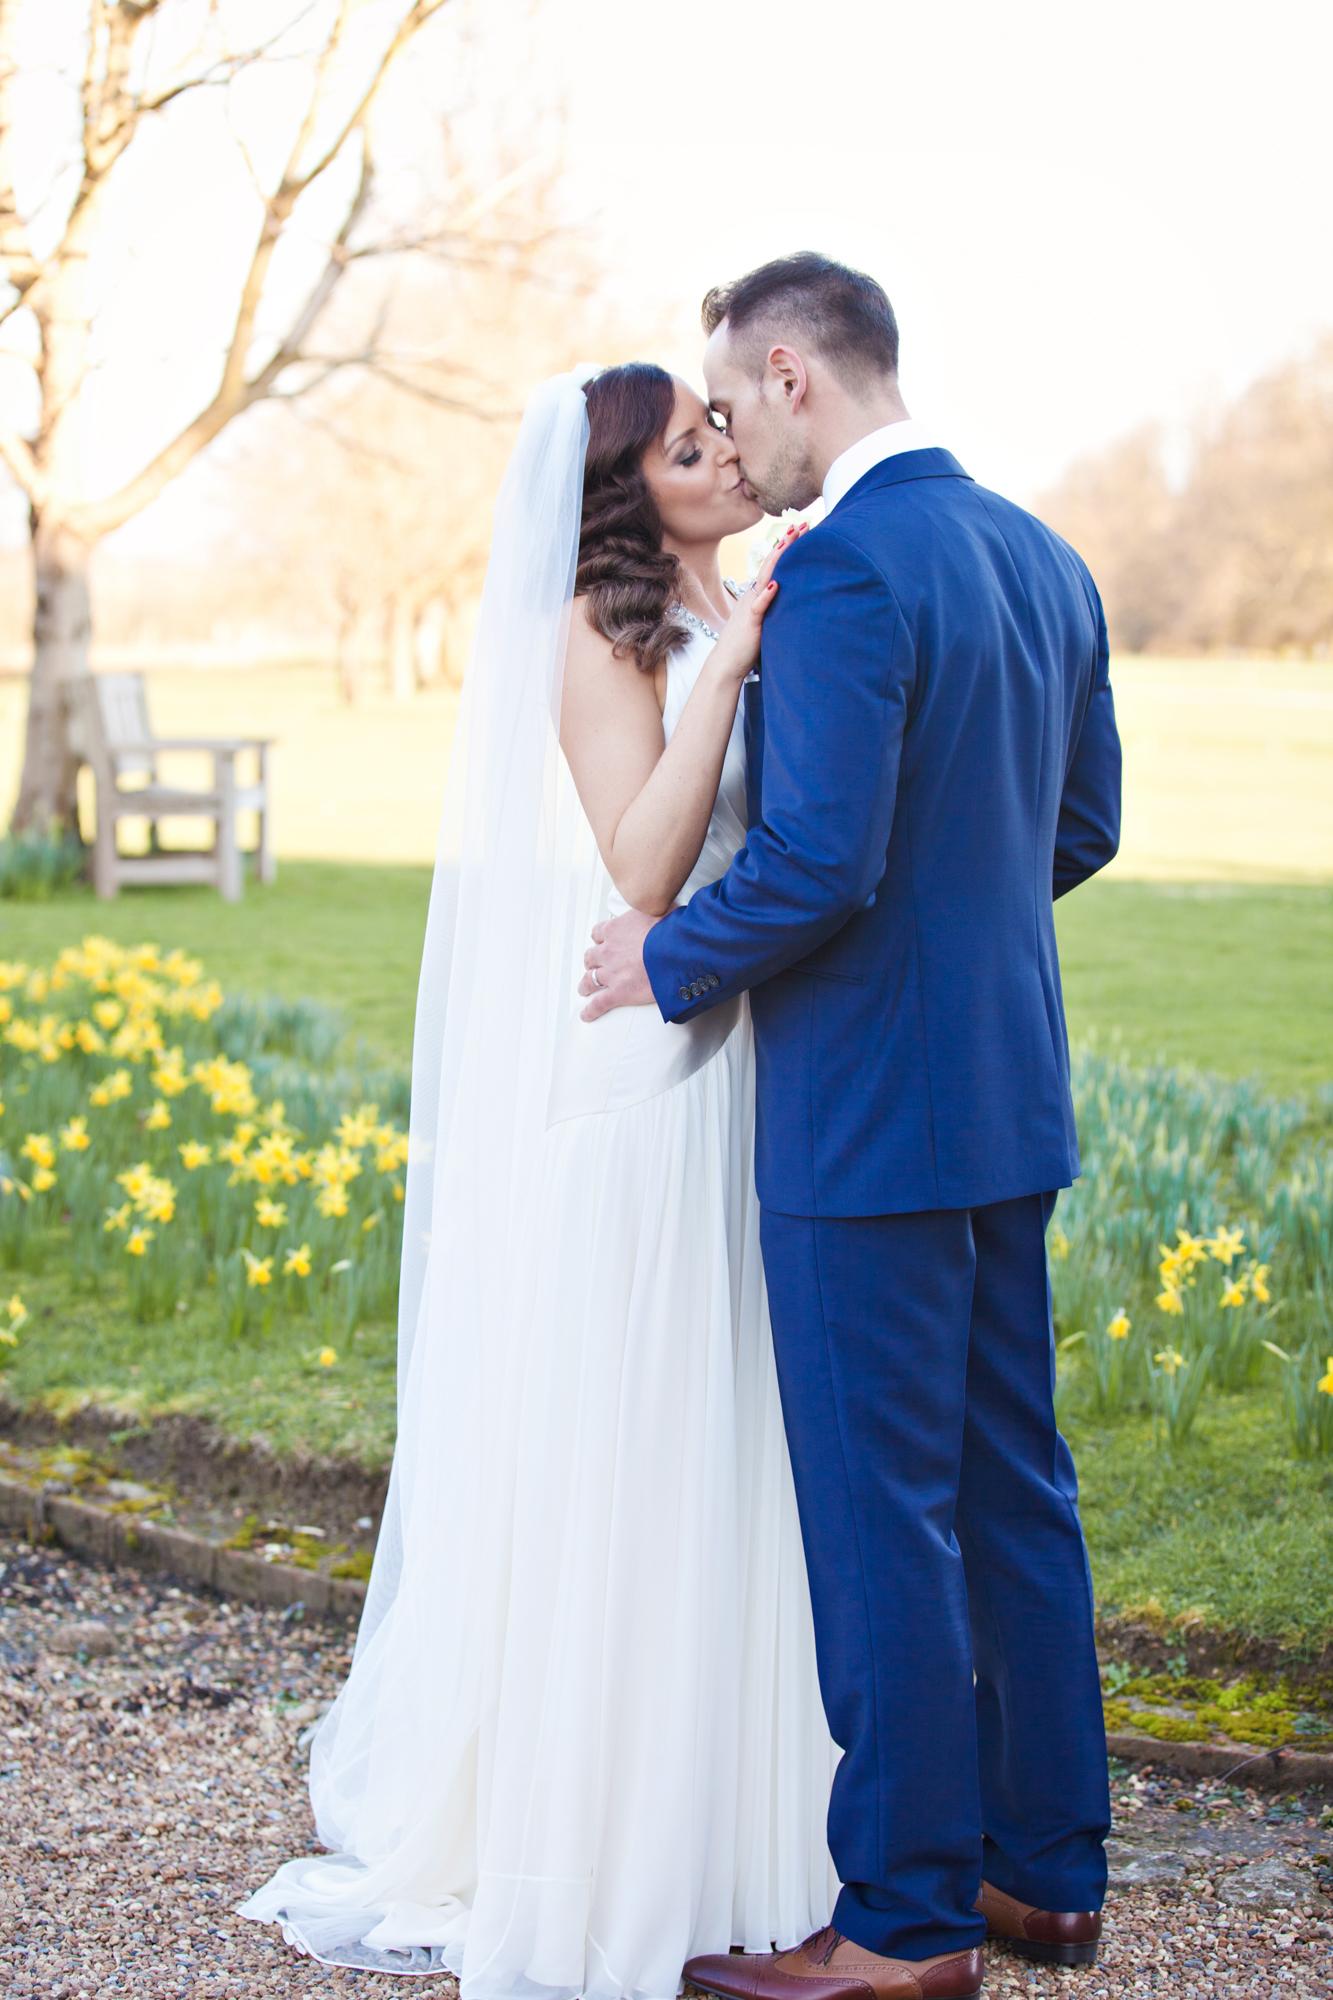 chilston park spring wedding photo